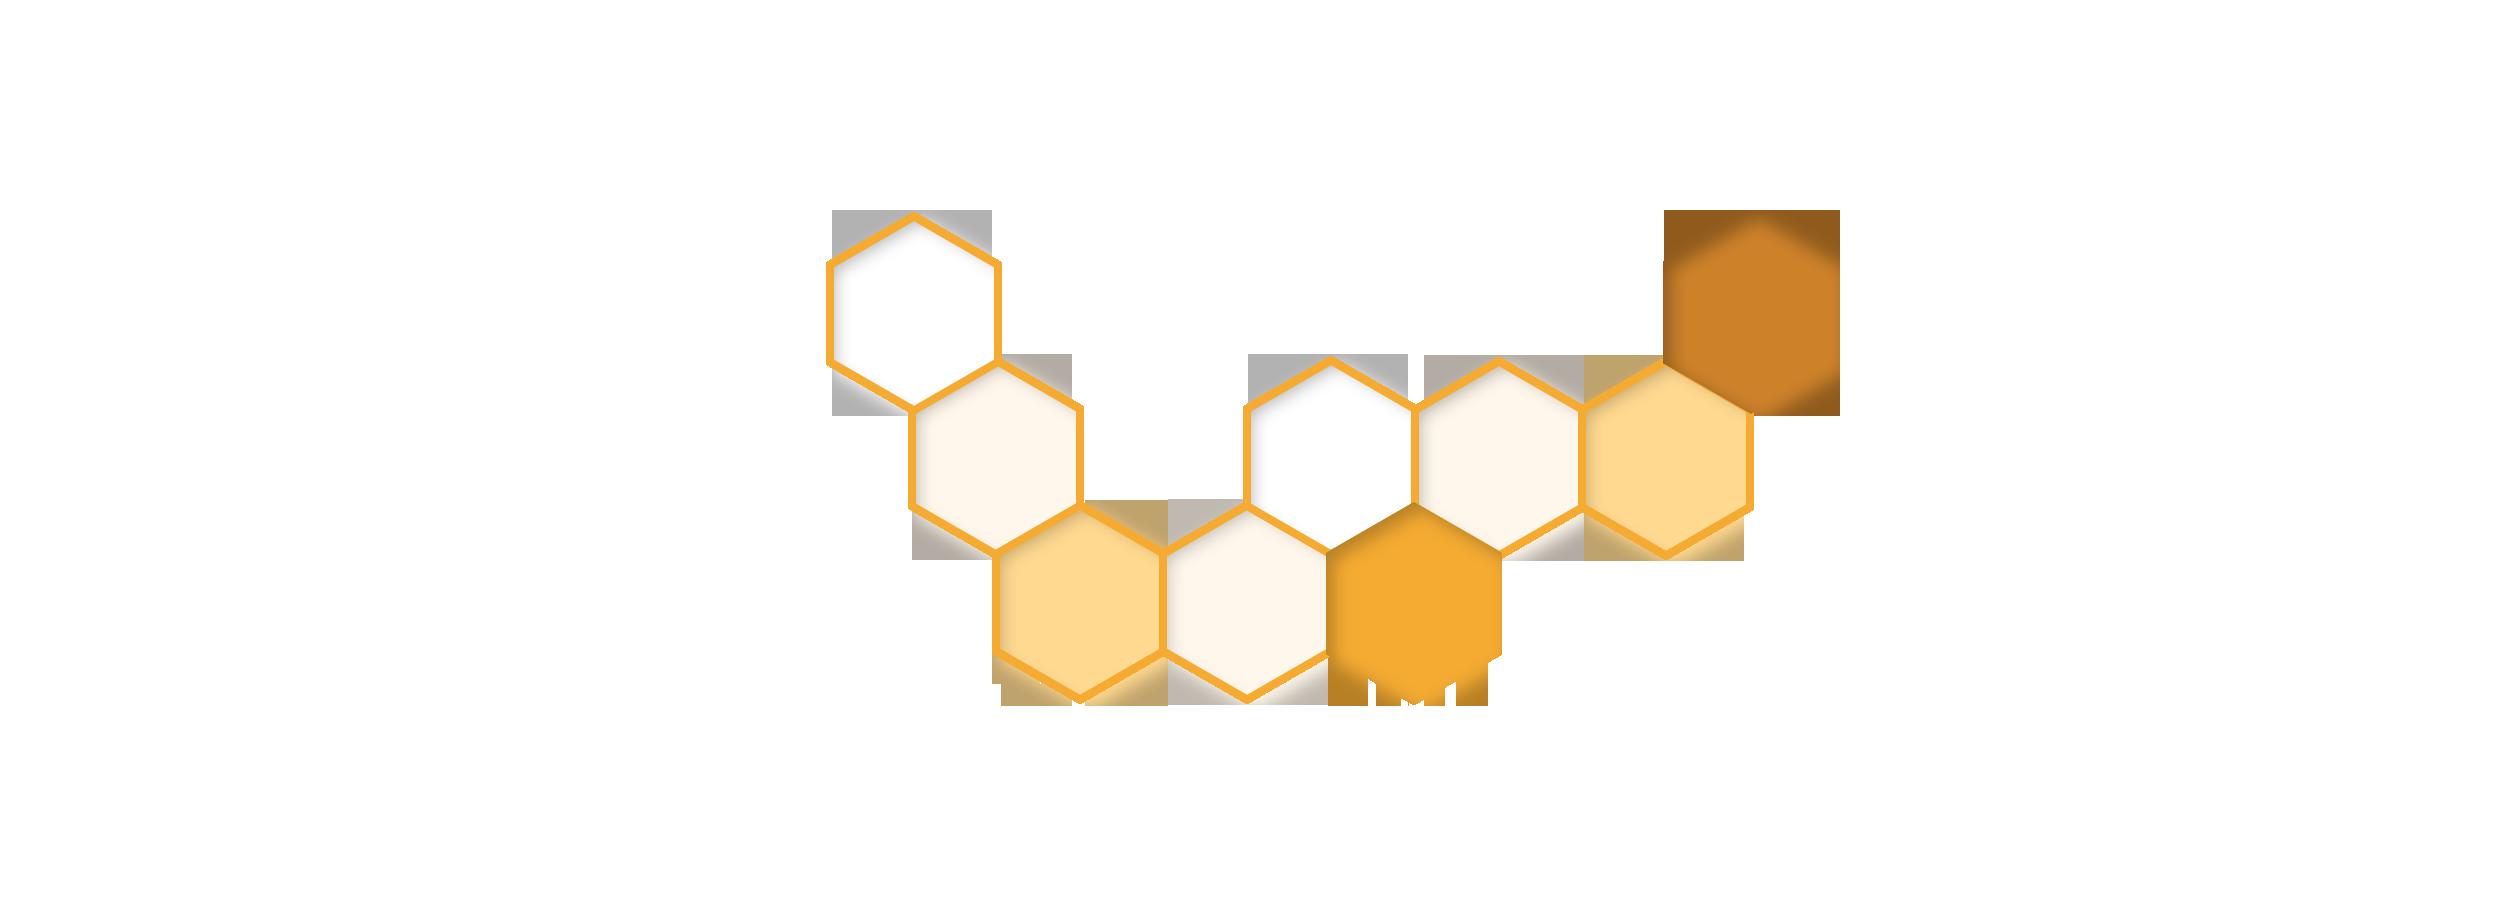 honeycomb_c5.png